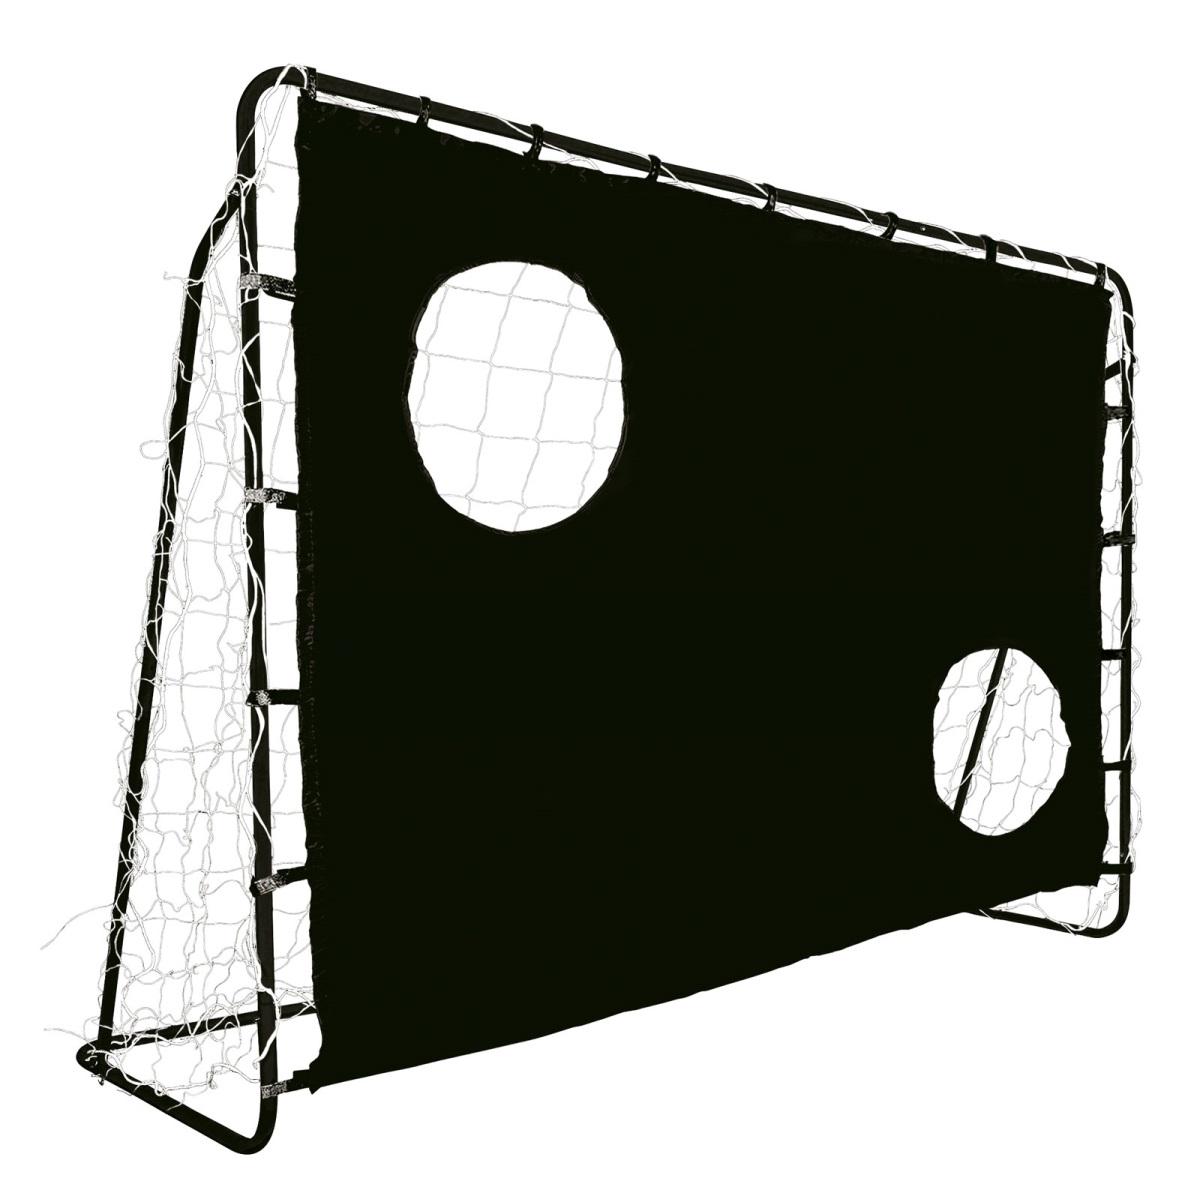 Fußballtor HATTRICK B/H. 215 x 150 cm - Metall